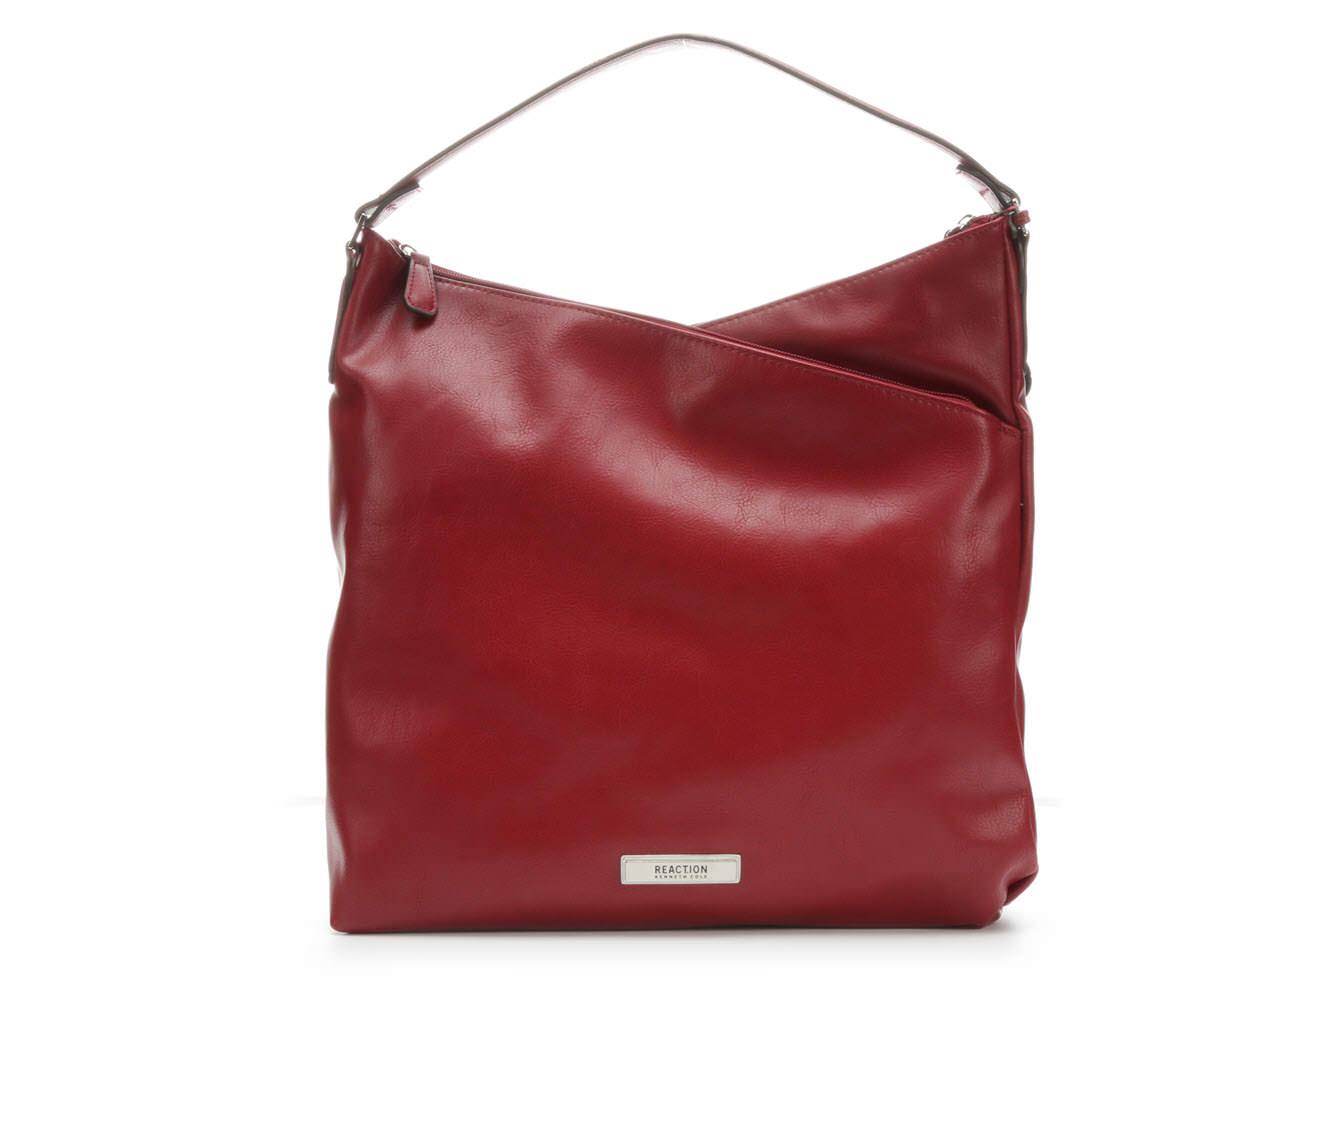 Kenneth Cole Reaction Tribeca Hobo Handbag (Red)